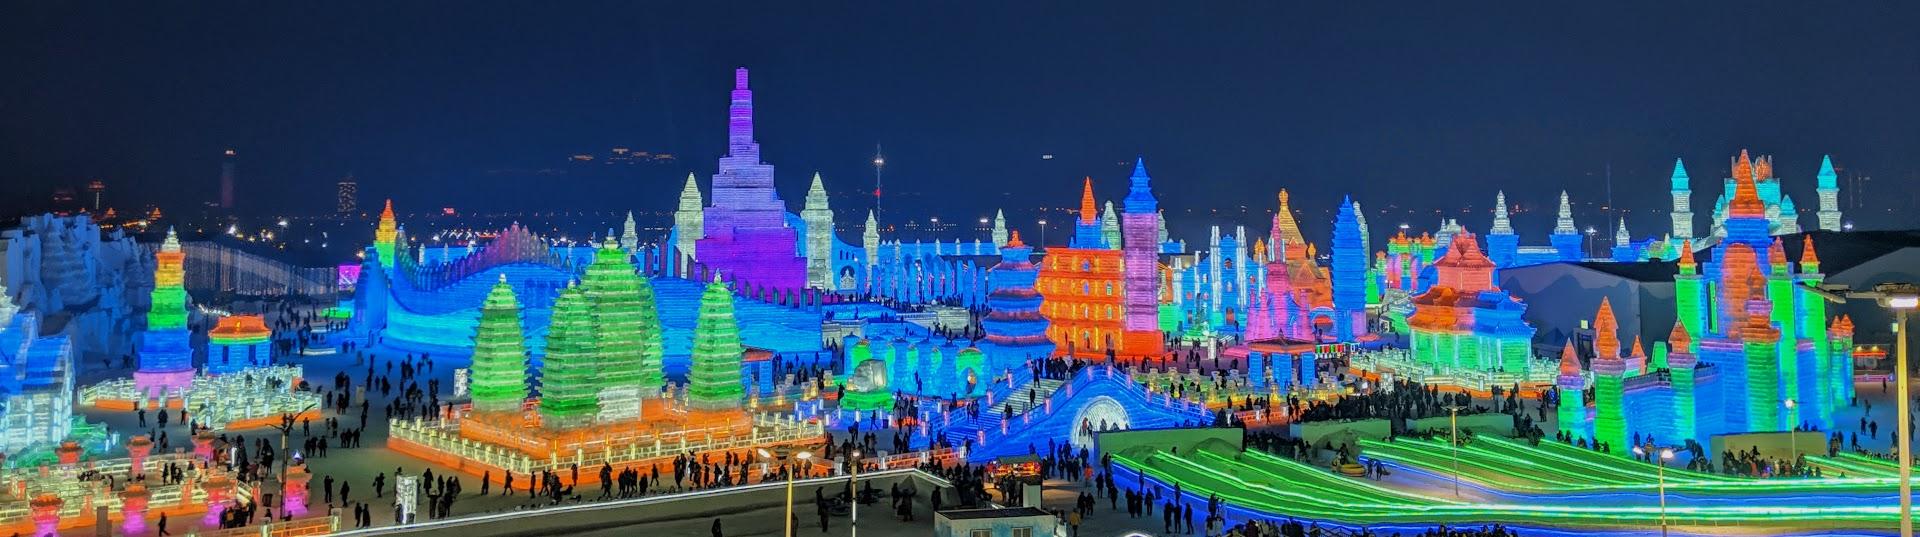 harbin ice festival panorama